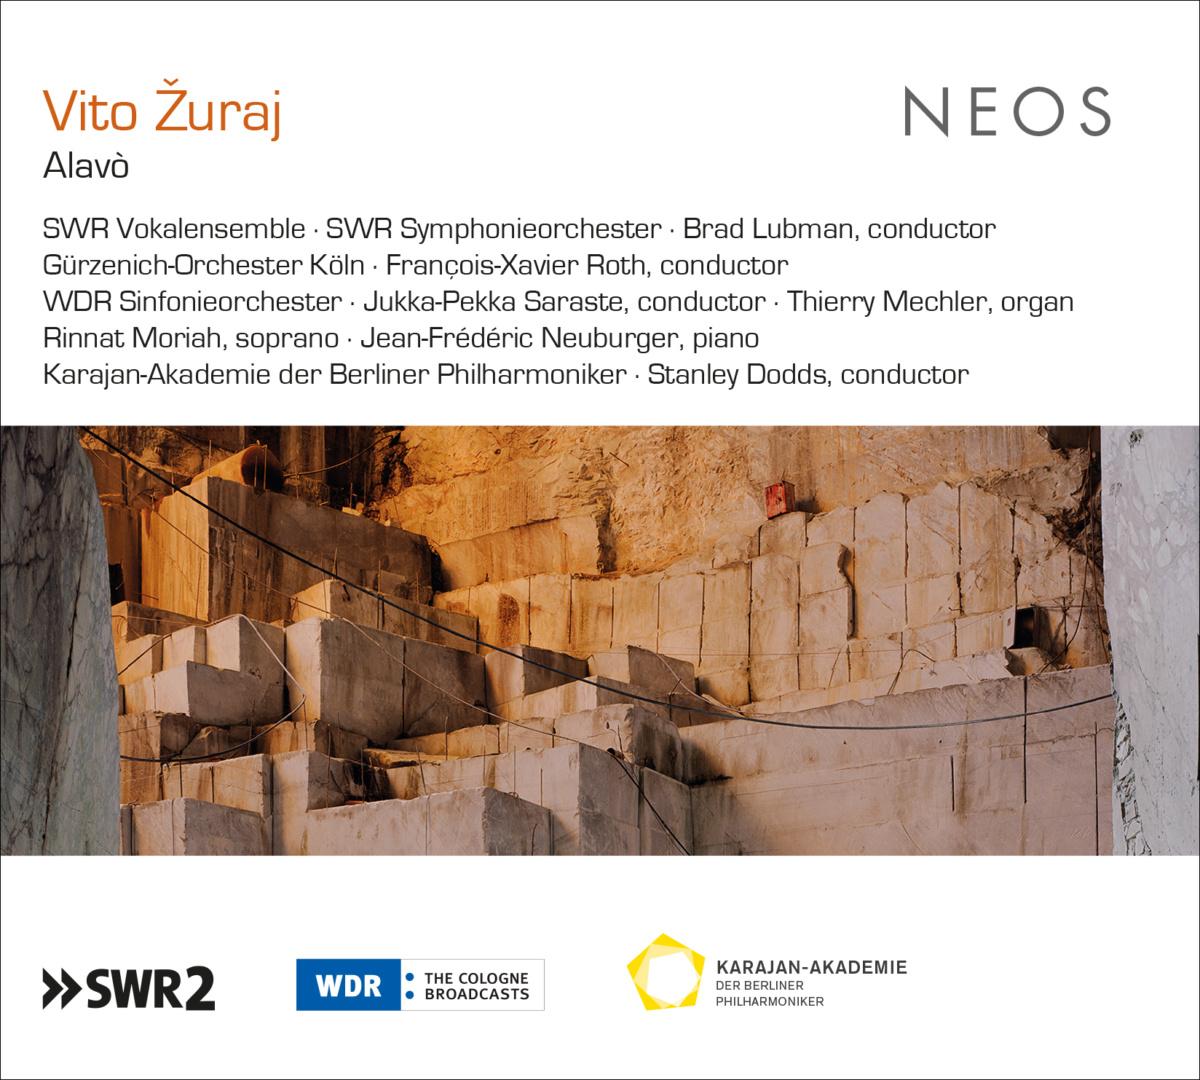 NEOS 12102 Zuraj